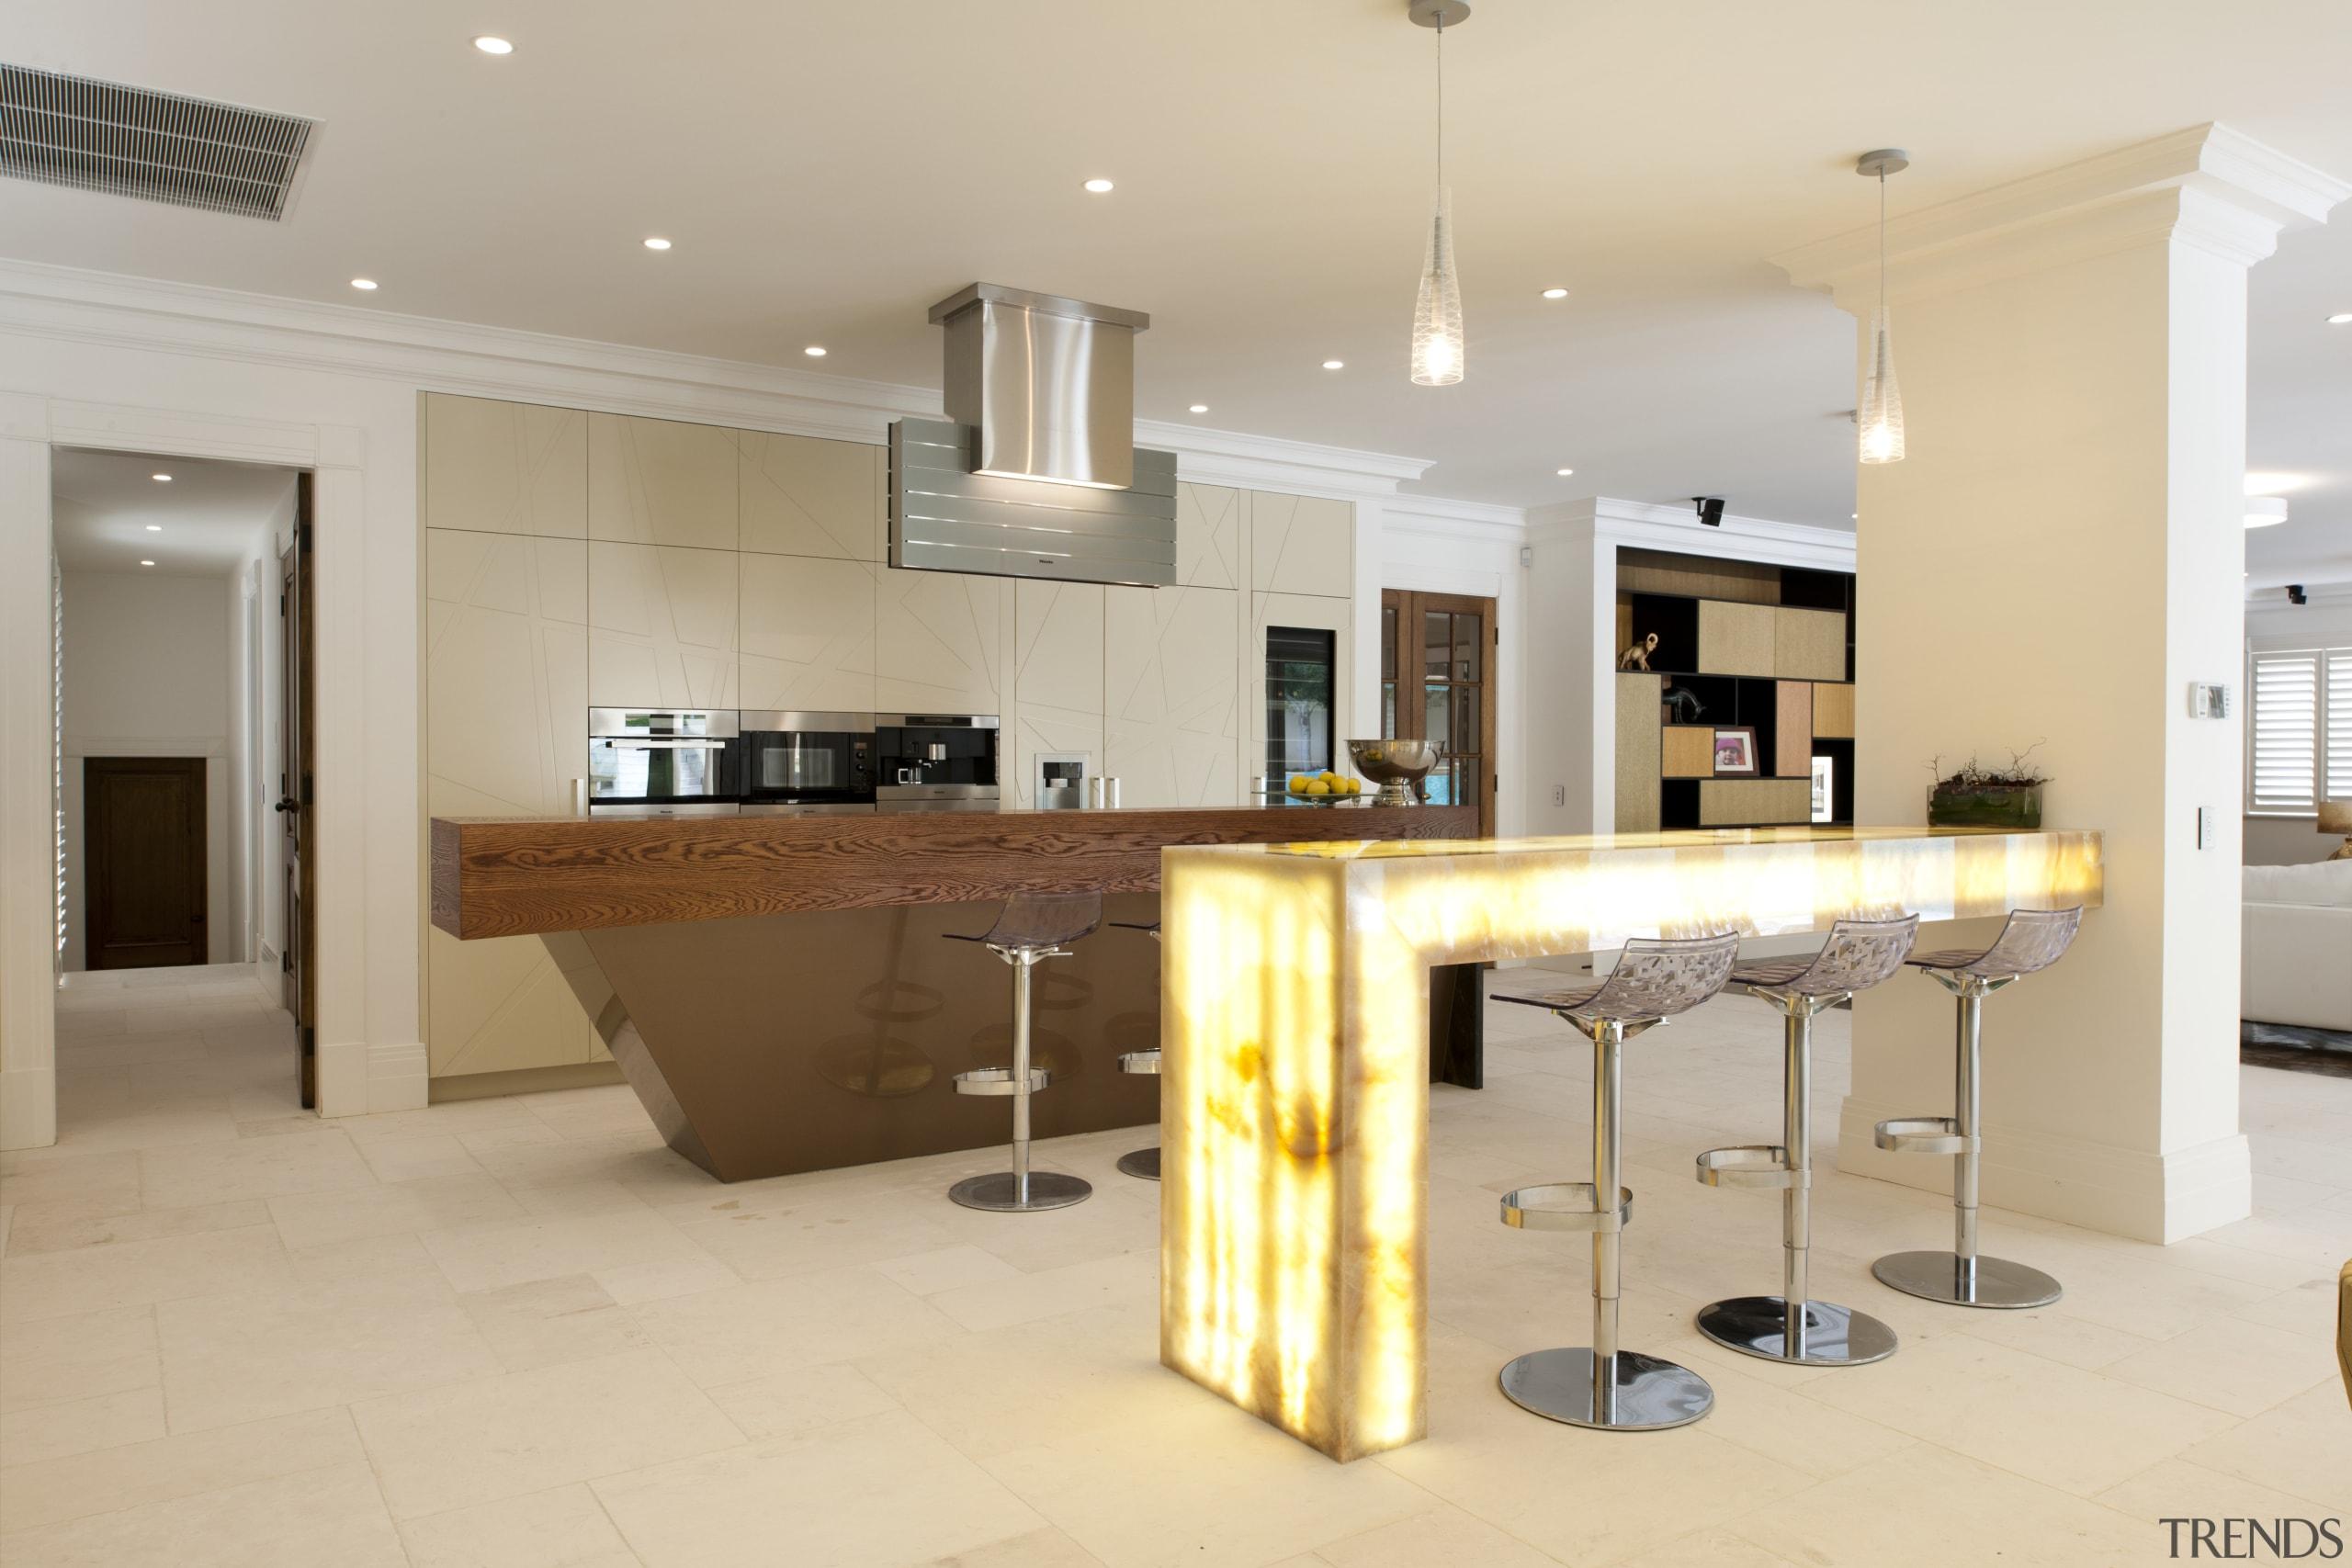 light breakfast bar is contrast to     - Gallery - 6   Trends